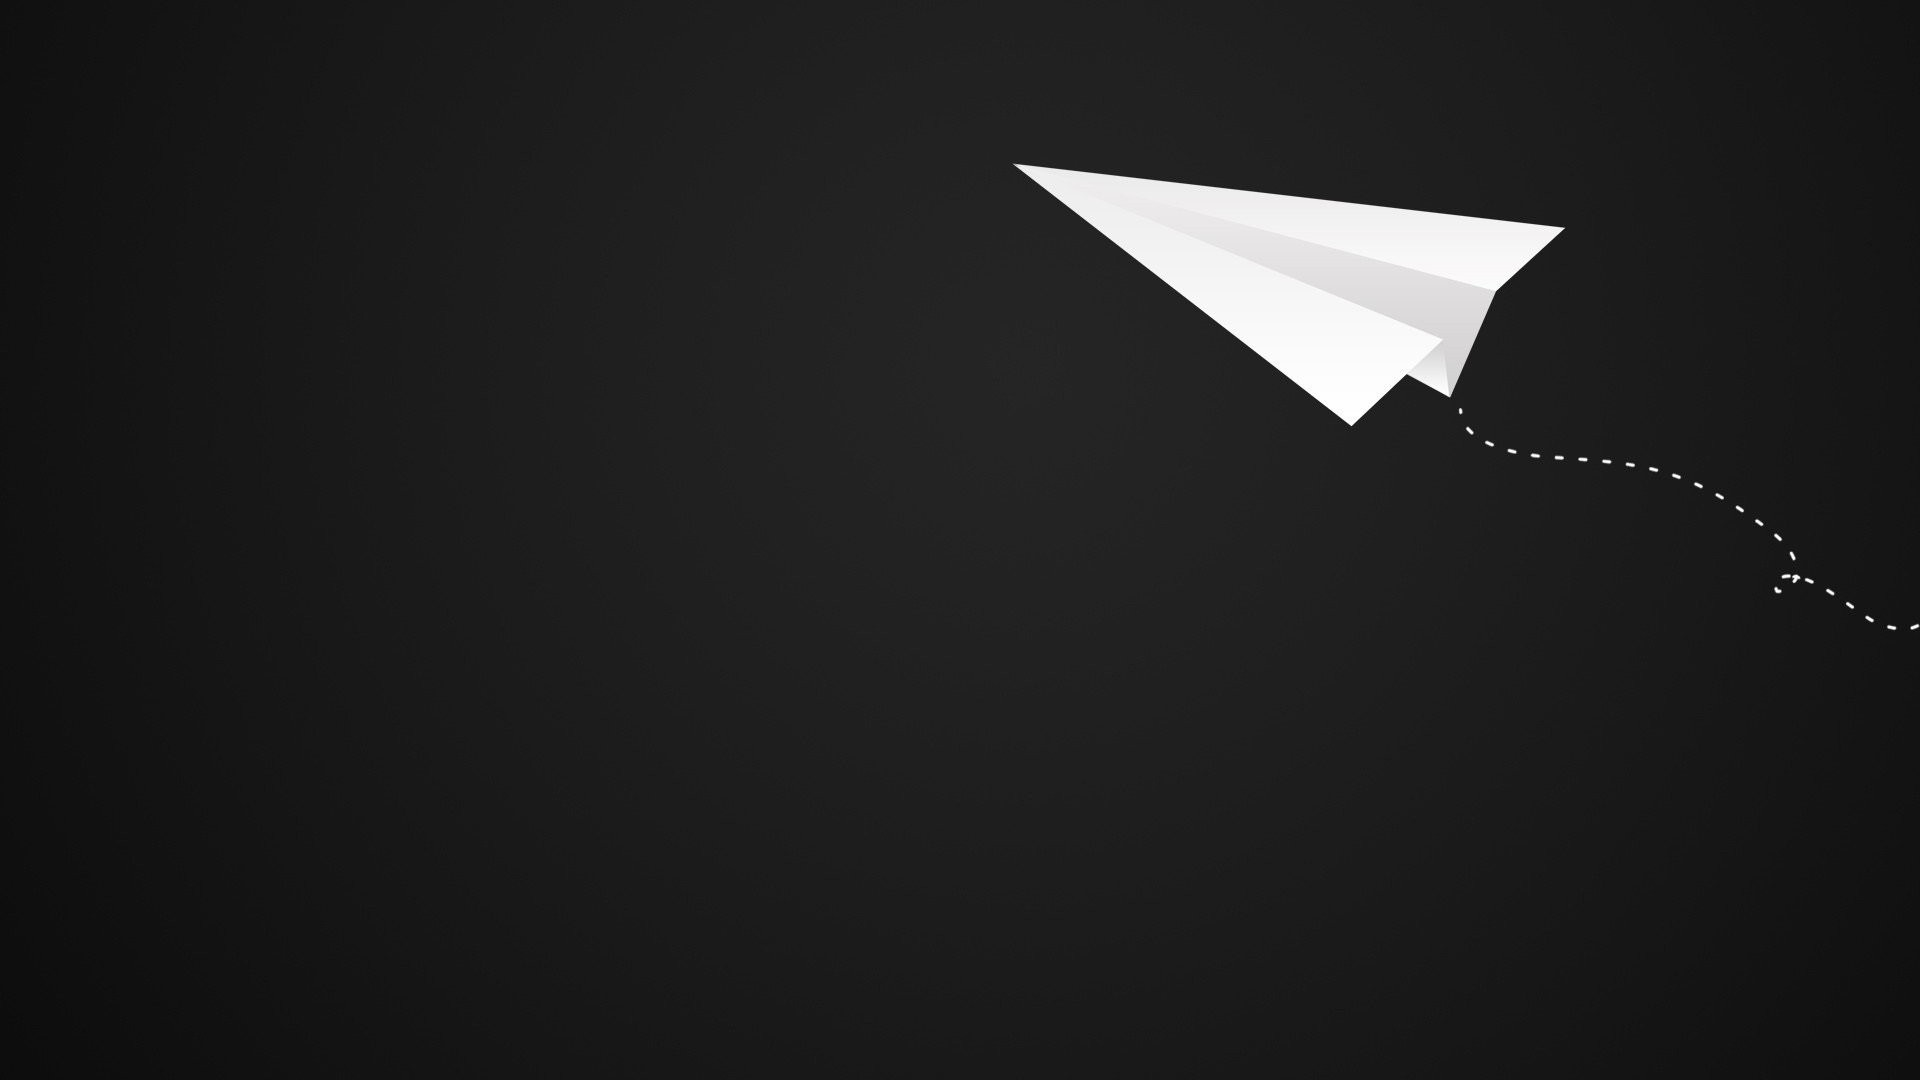 Paper Airplane pics